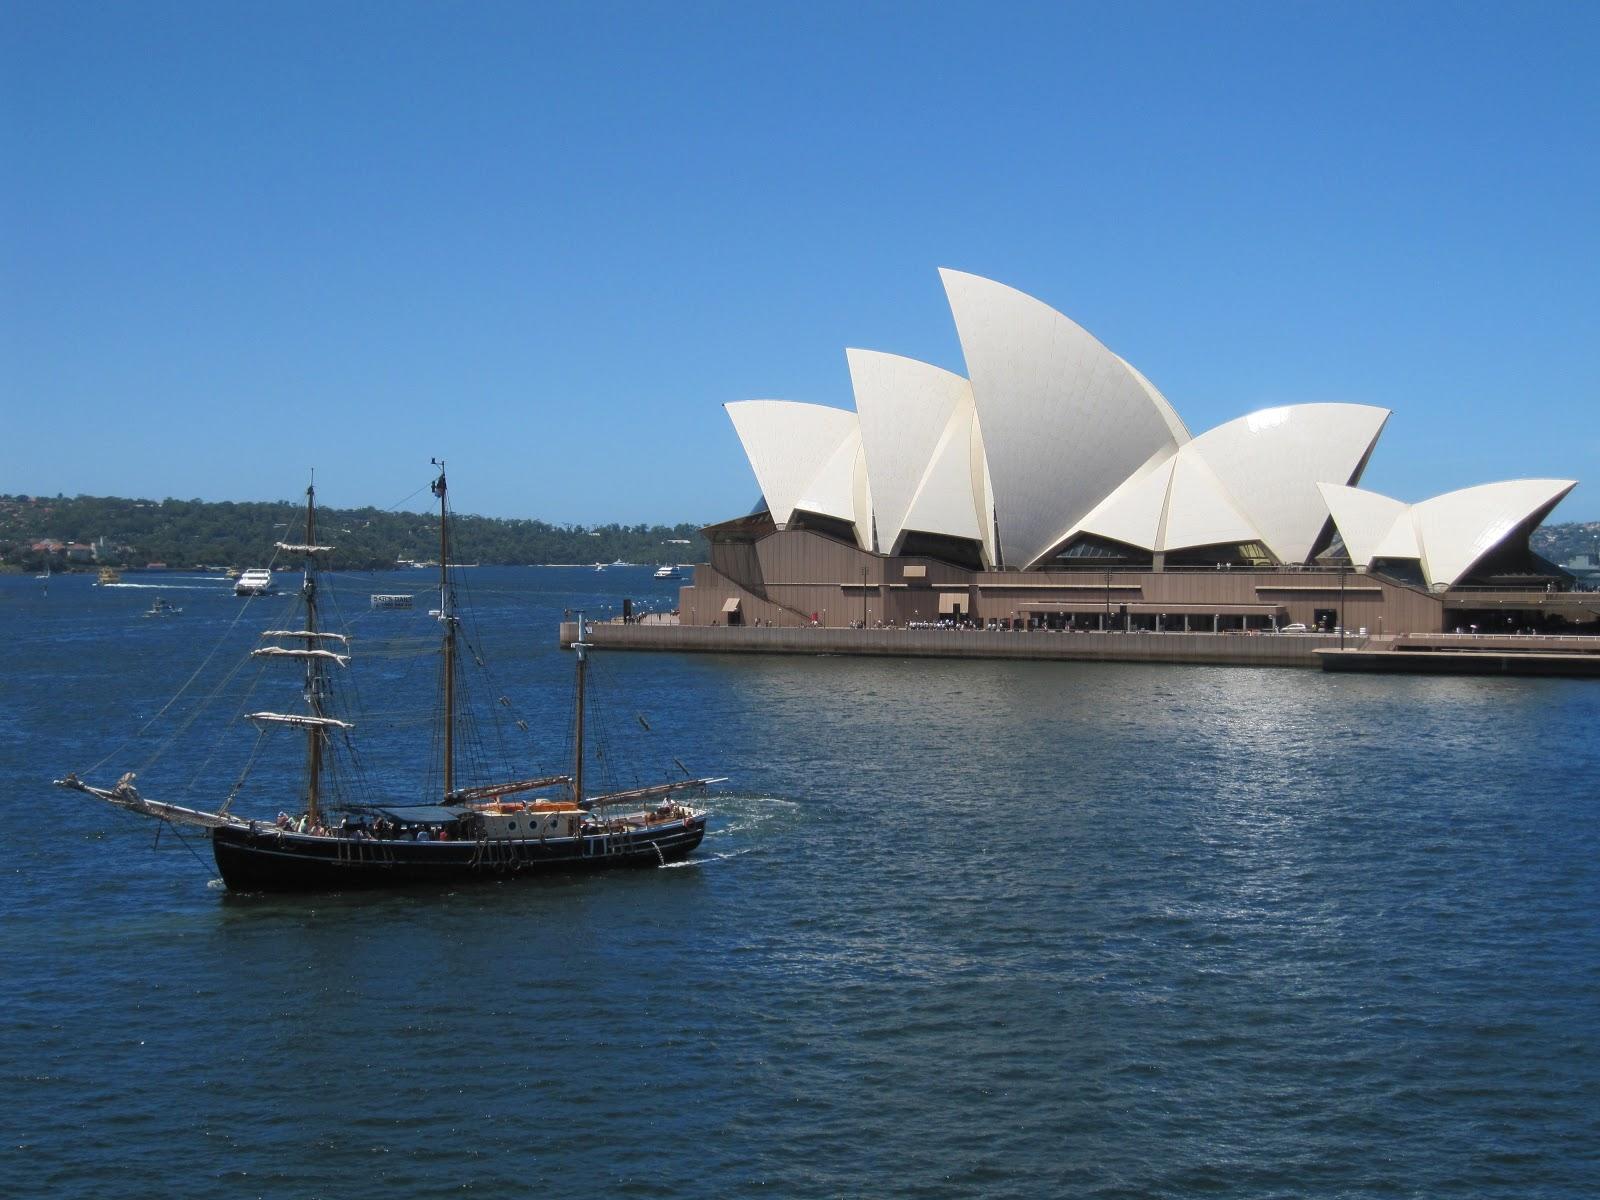 sydney ships - photo#14